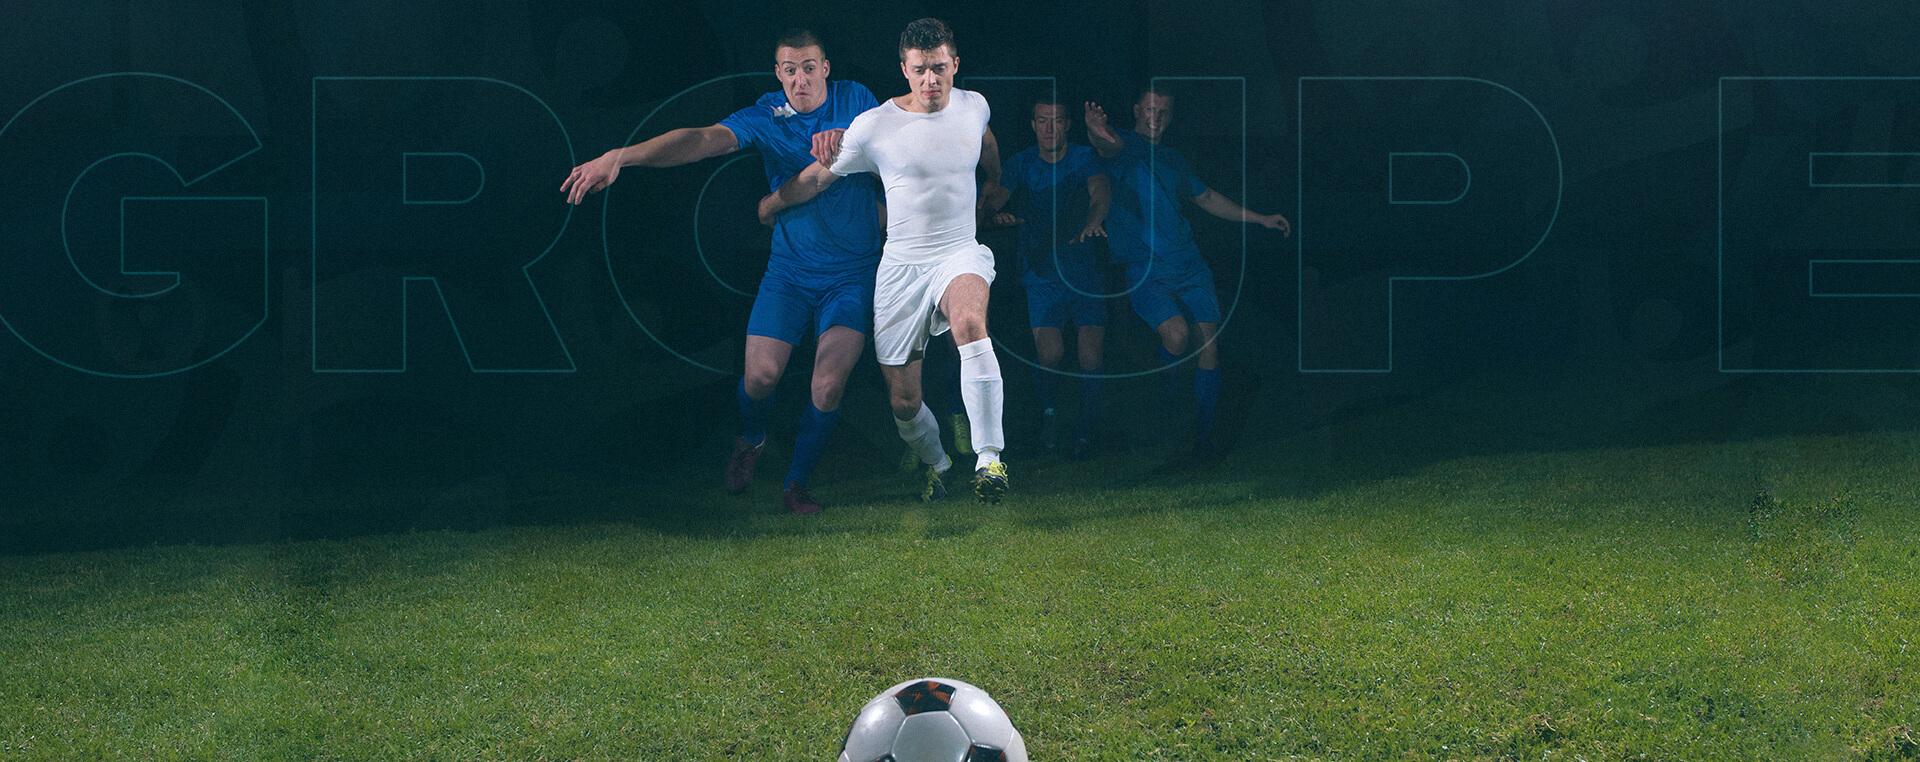 UEFA EURO 2020 (2021) – Group E